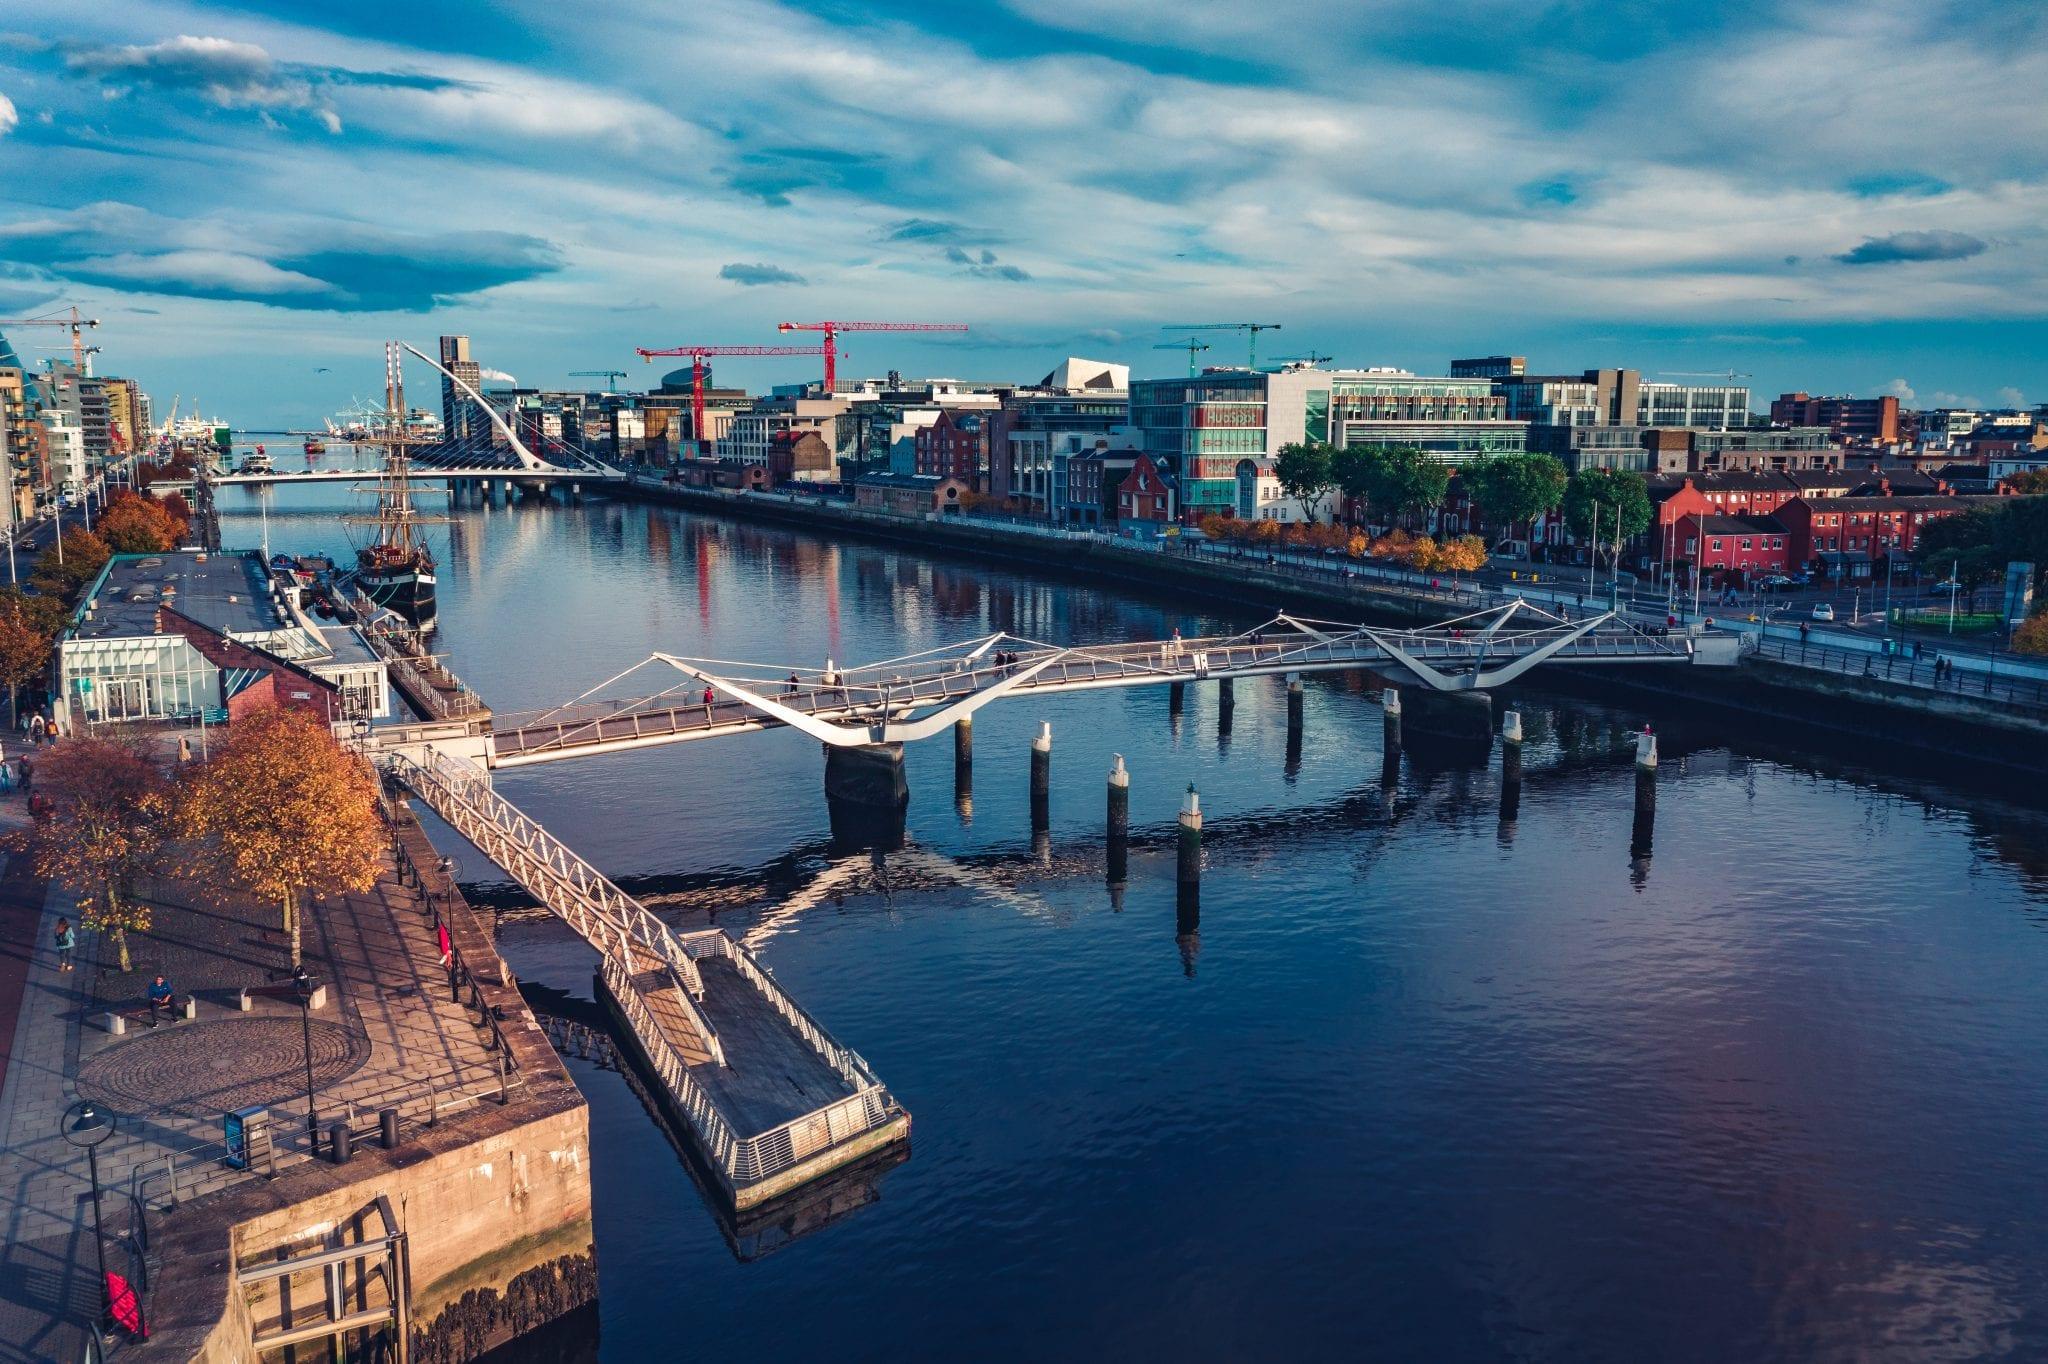 An overview of bridges along the dock in Dublin